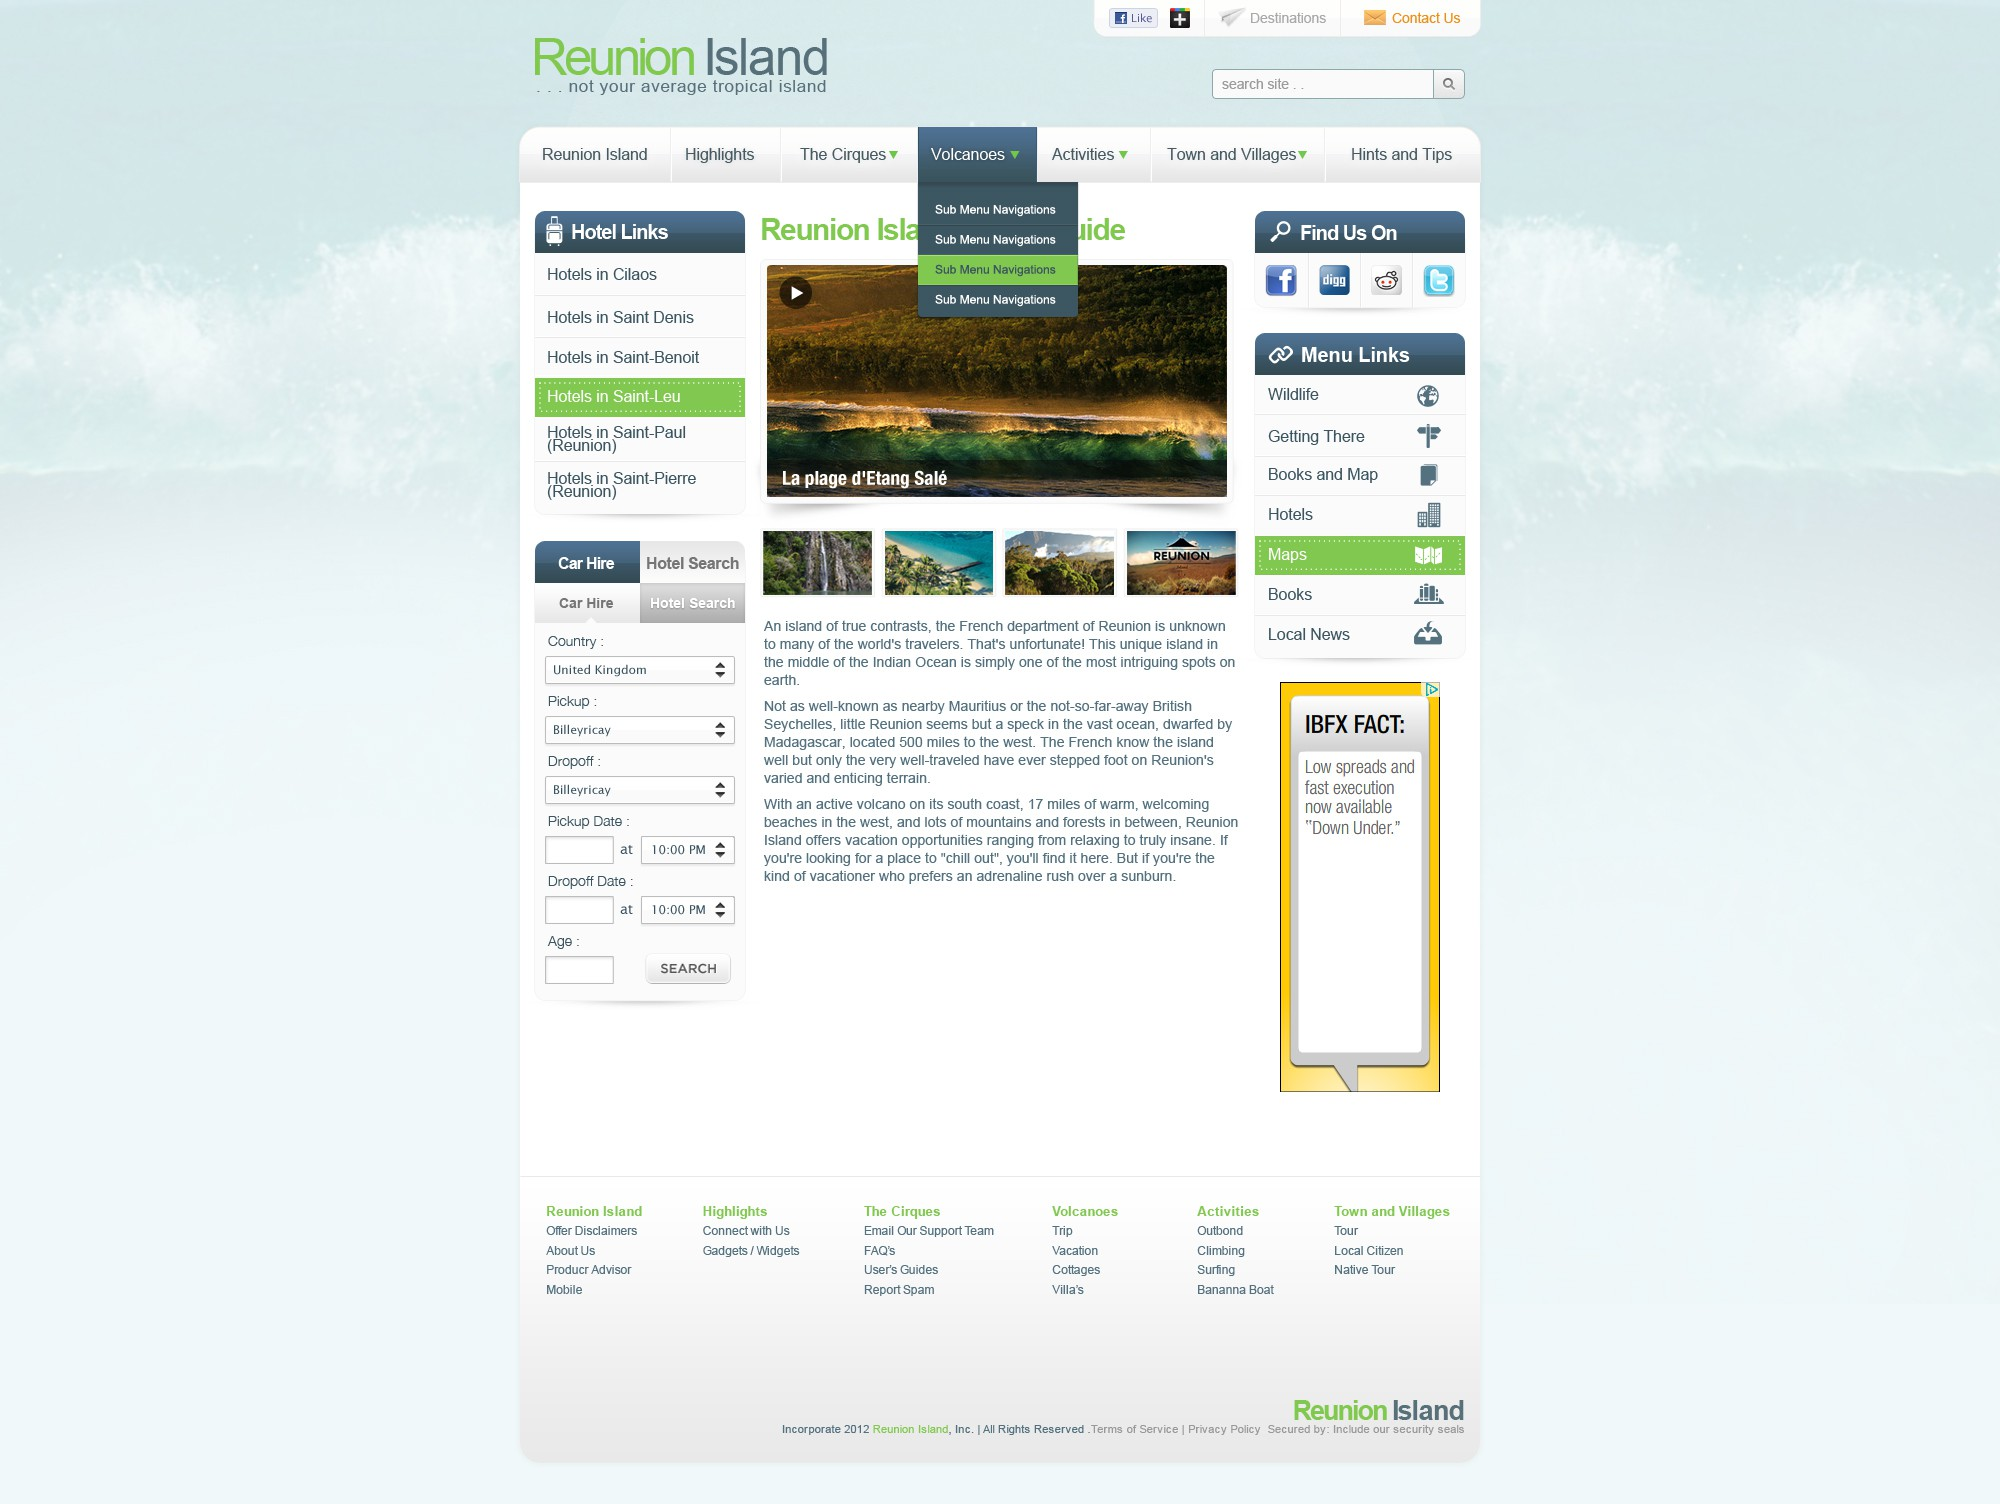 Reunion Island needs a new website design